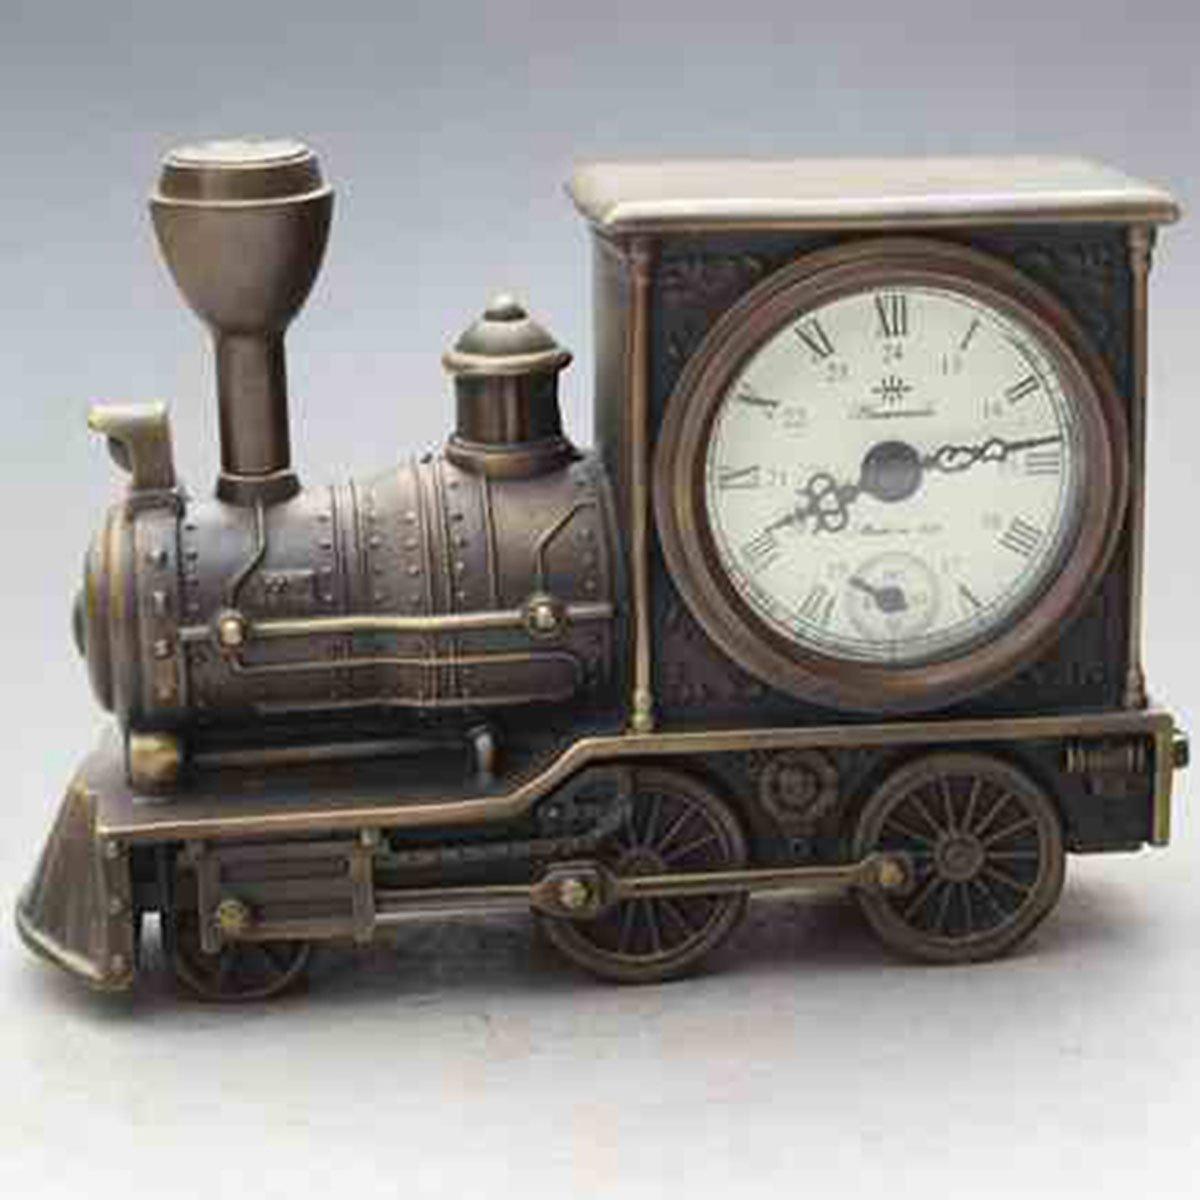 Originality modelling locomotives brass watch Mechanics Desk clock Decoration by Sunmir